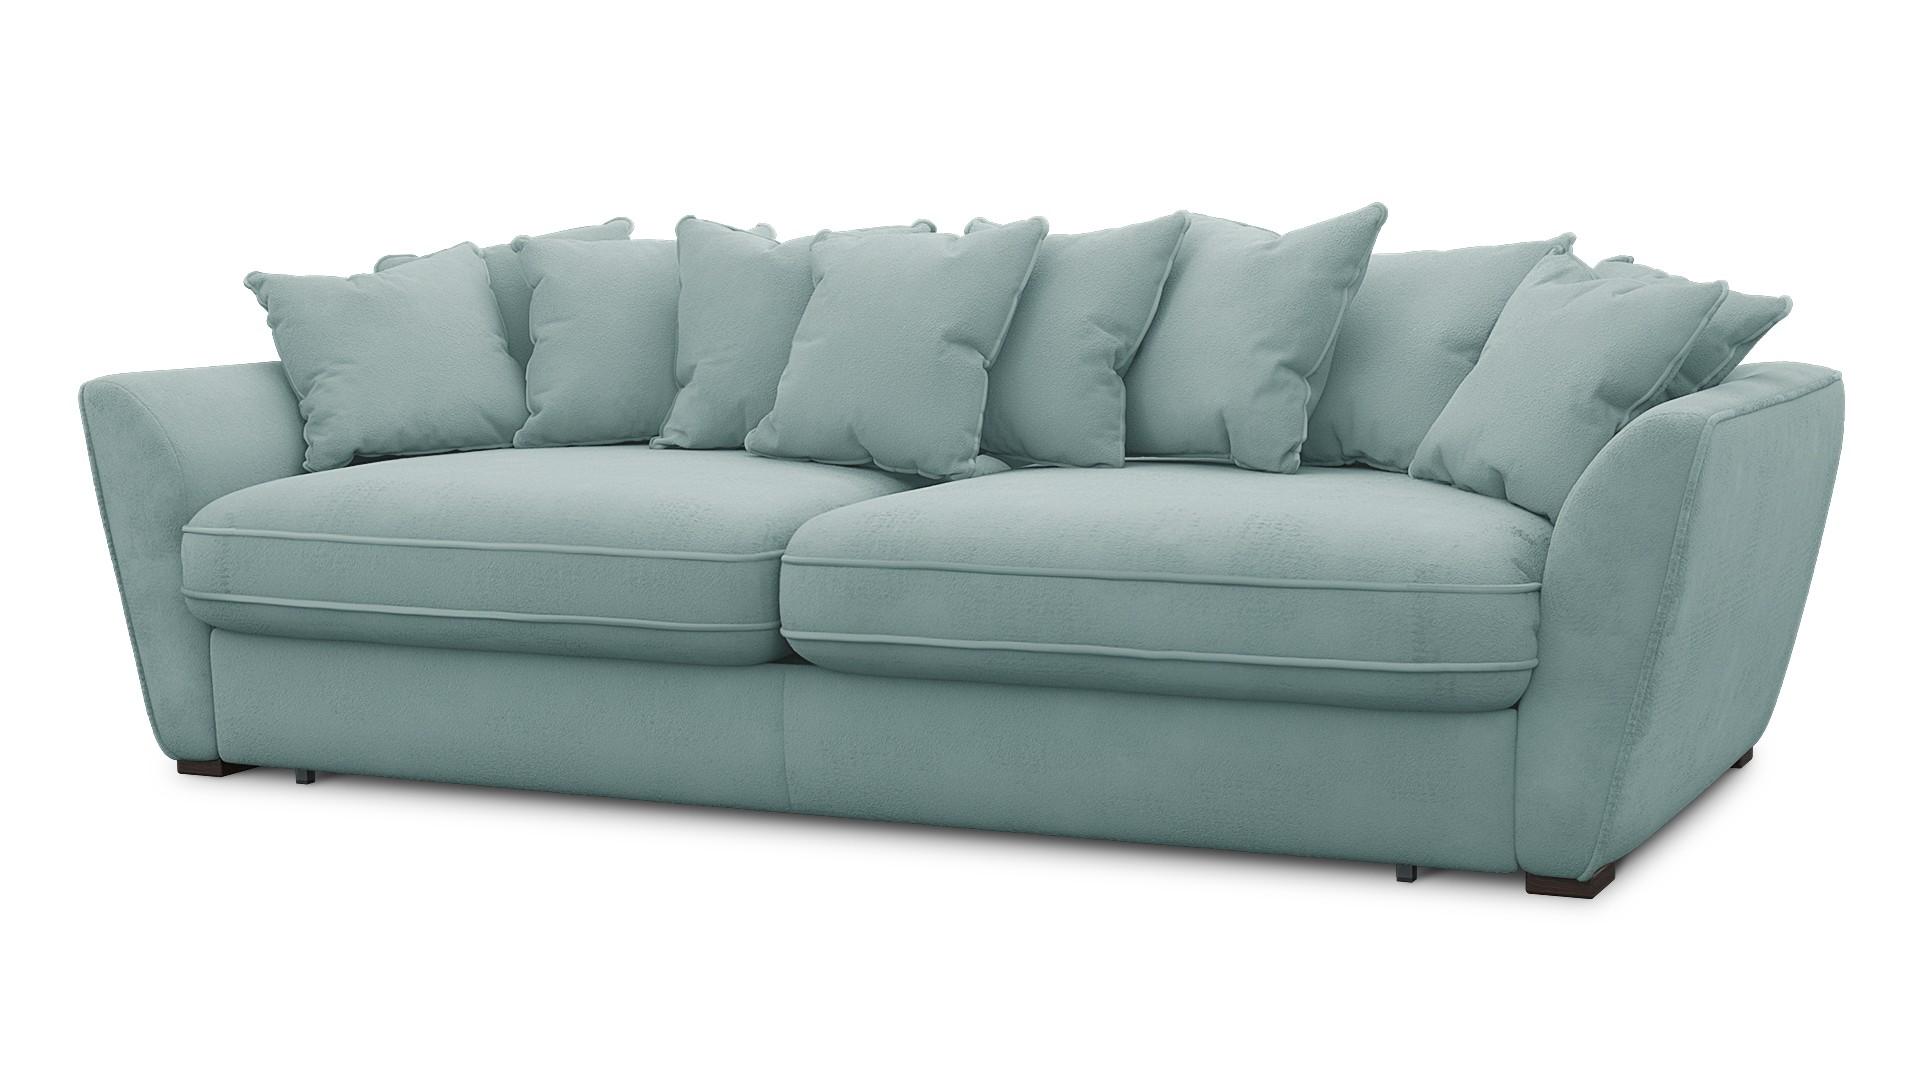 Fiesta диван верона серый 133770/2